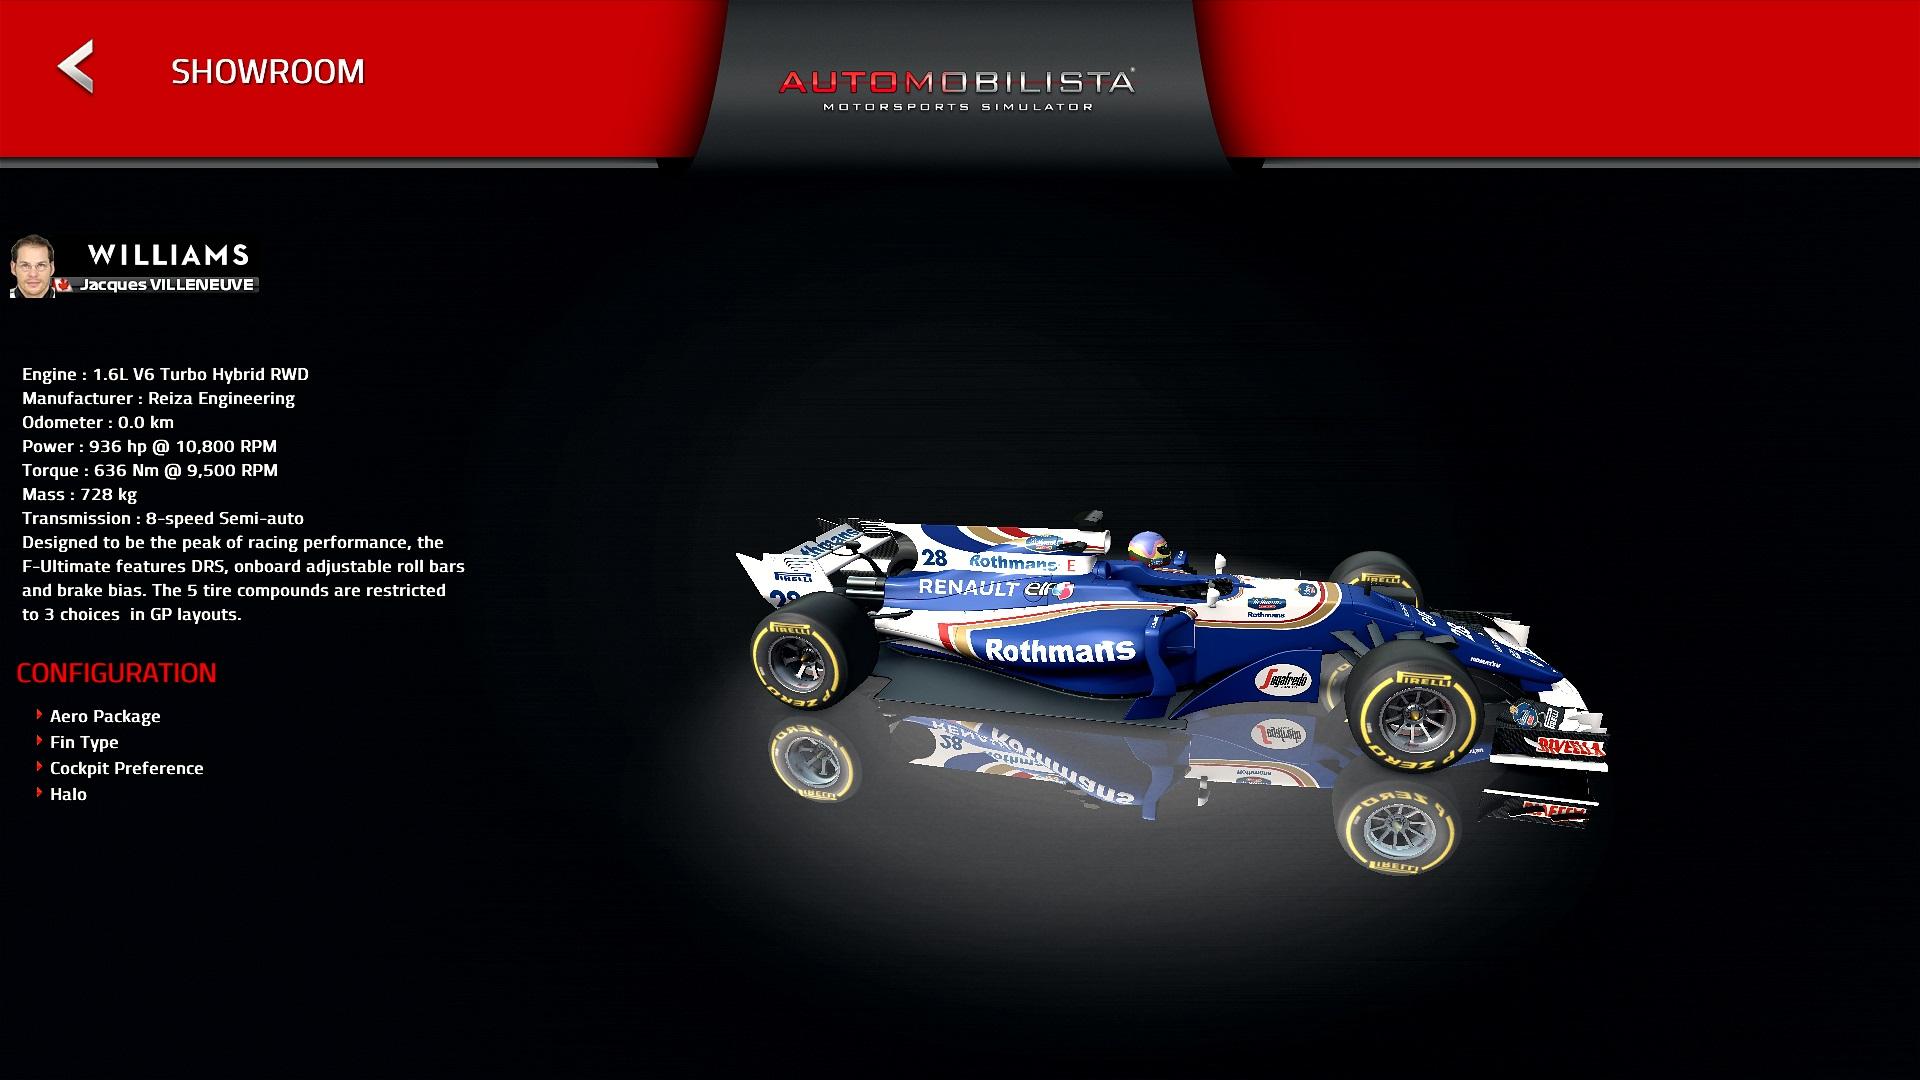 WilliamsRothmans1.jpg